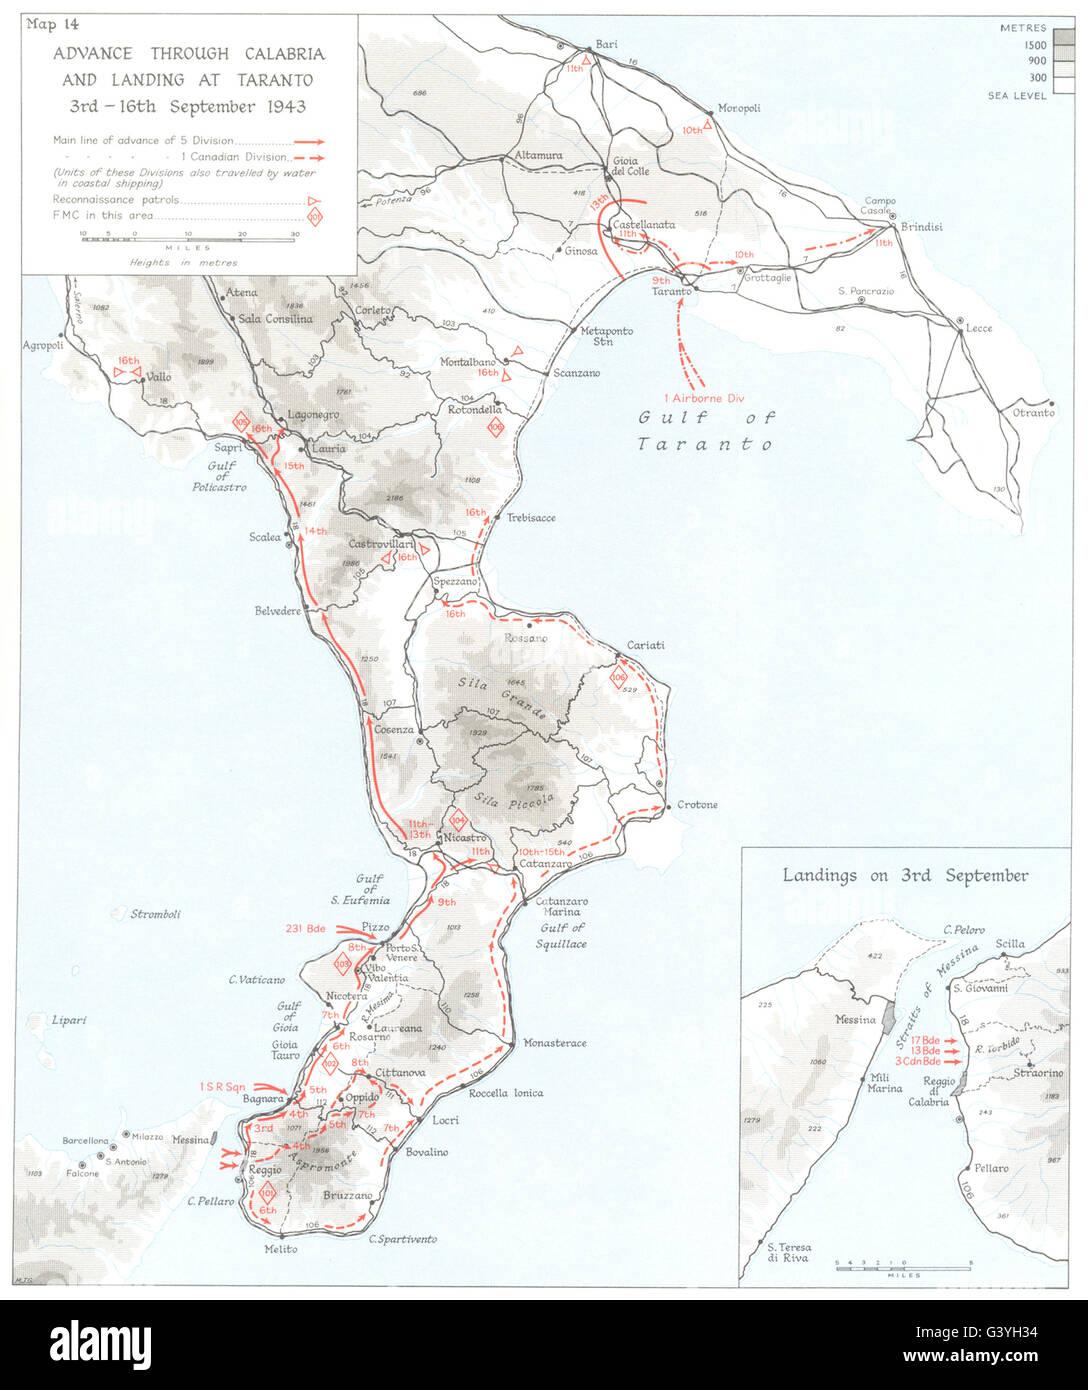 ITALY Invasion of Calabria Sep 1943 Advance Landing at Taranto